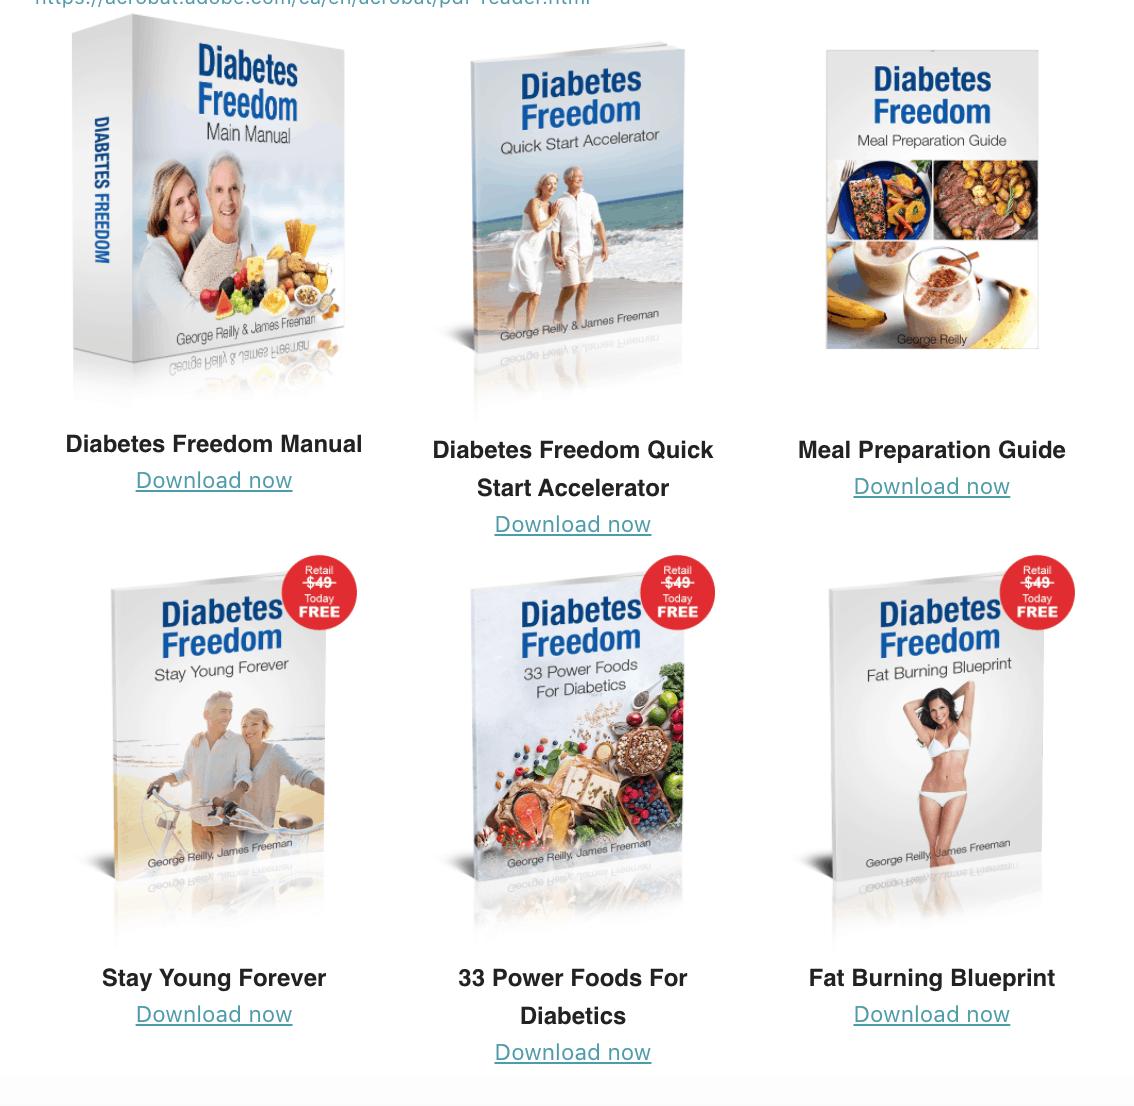 Diabetes Freedom main manual